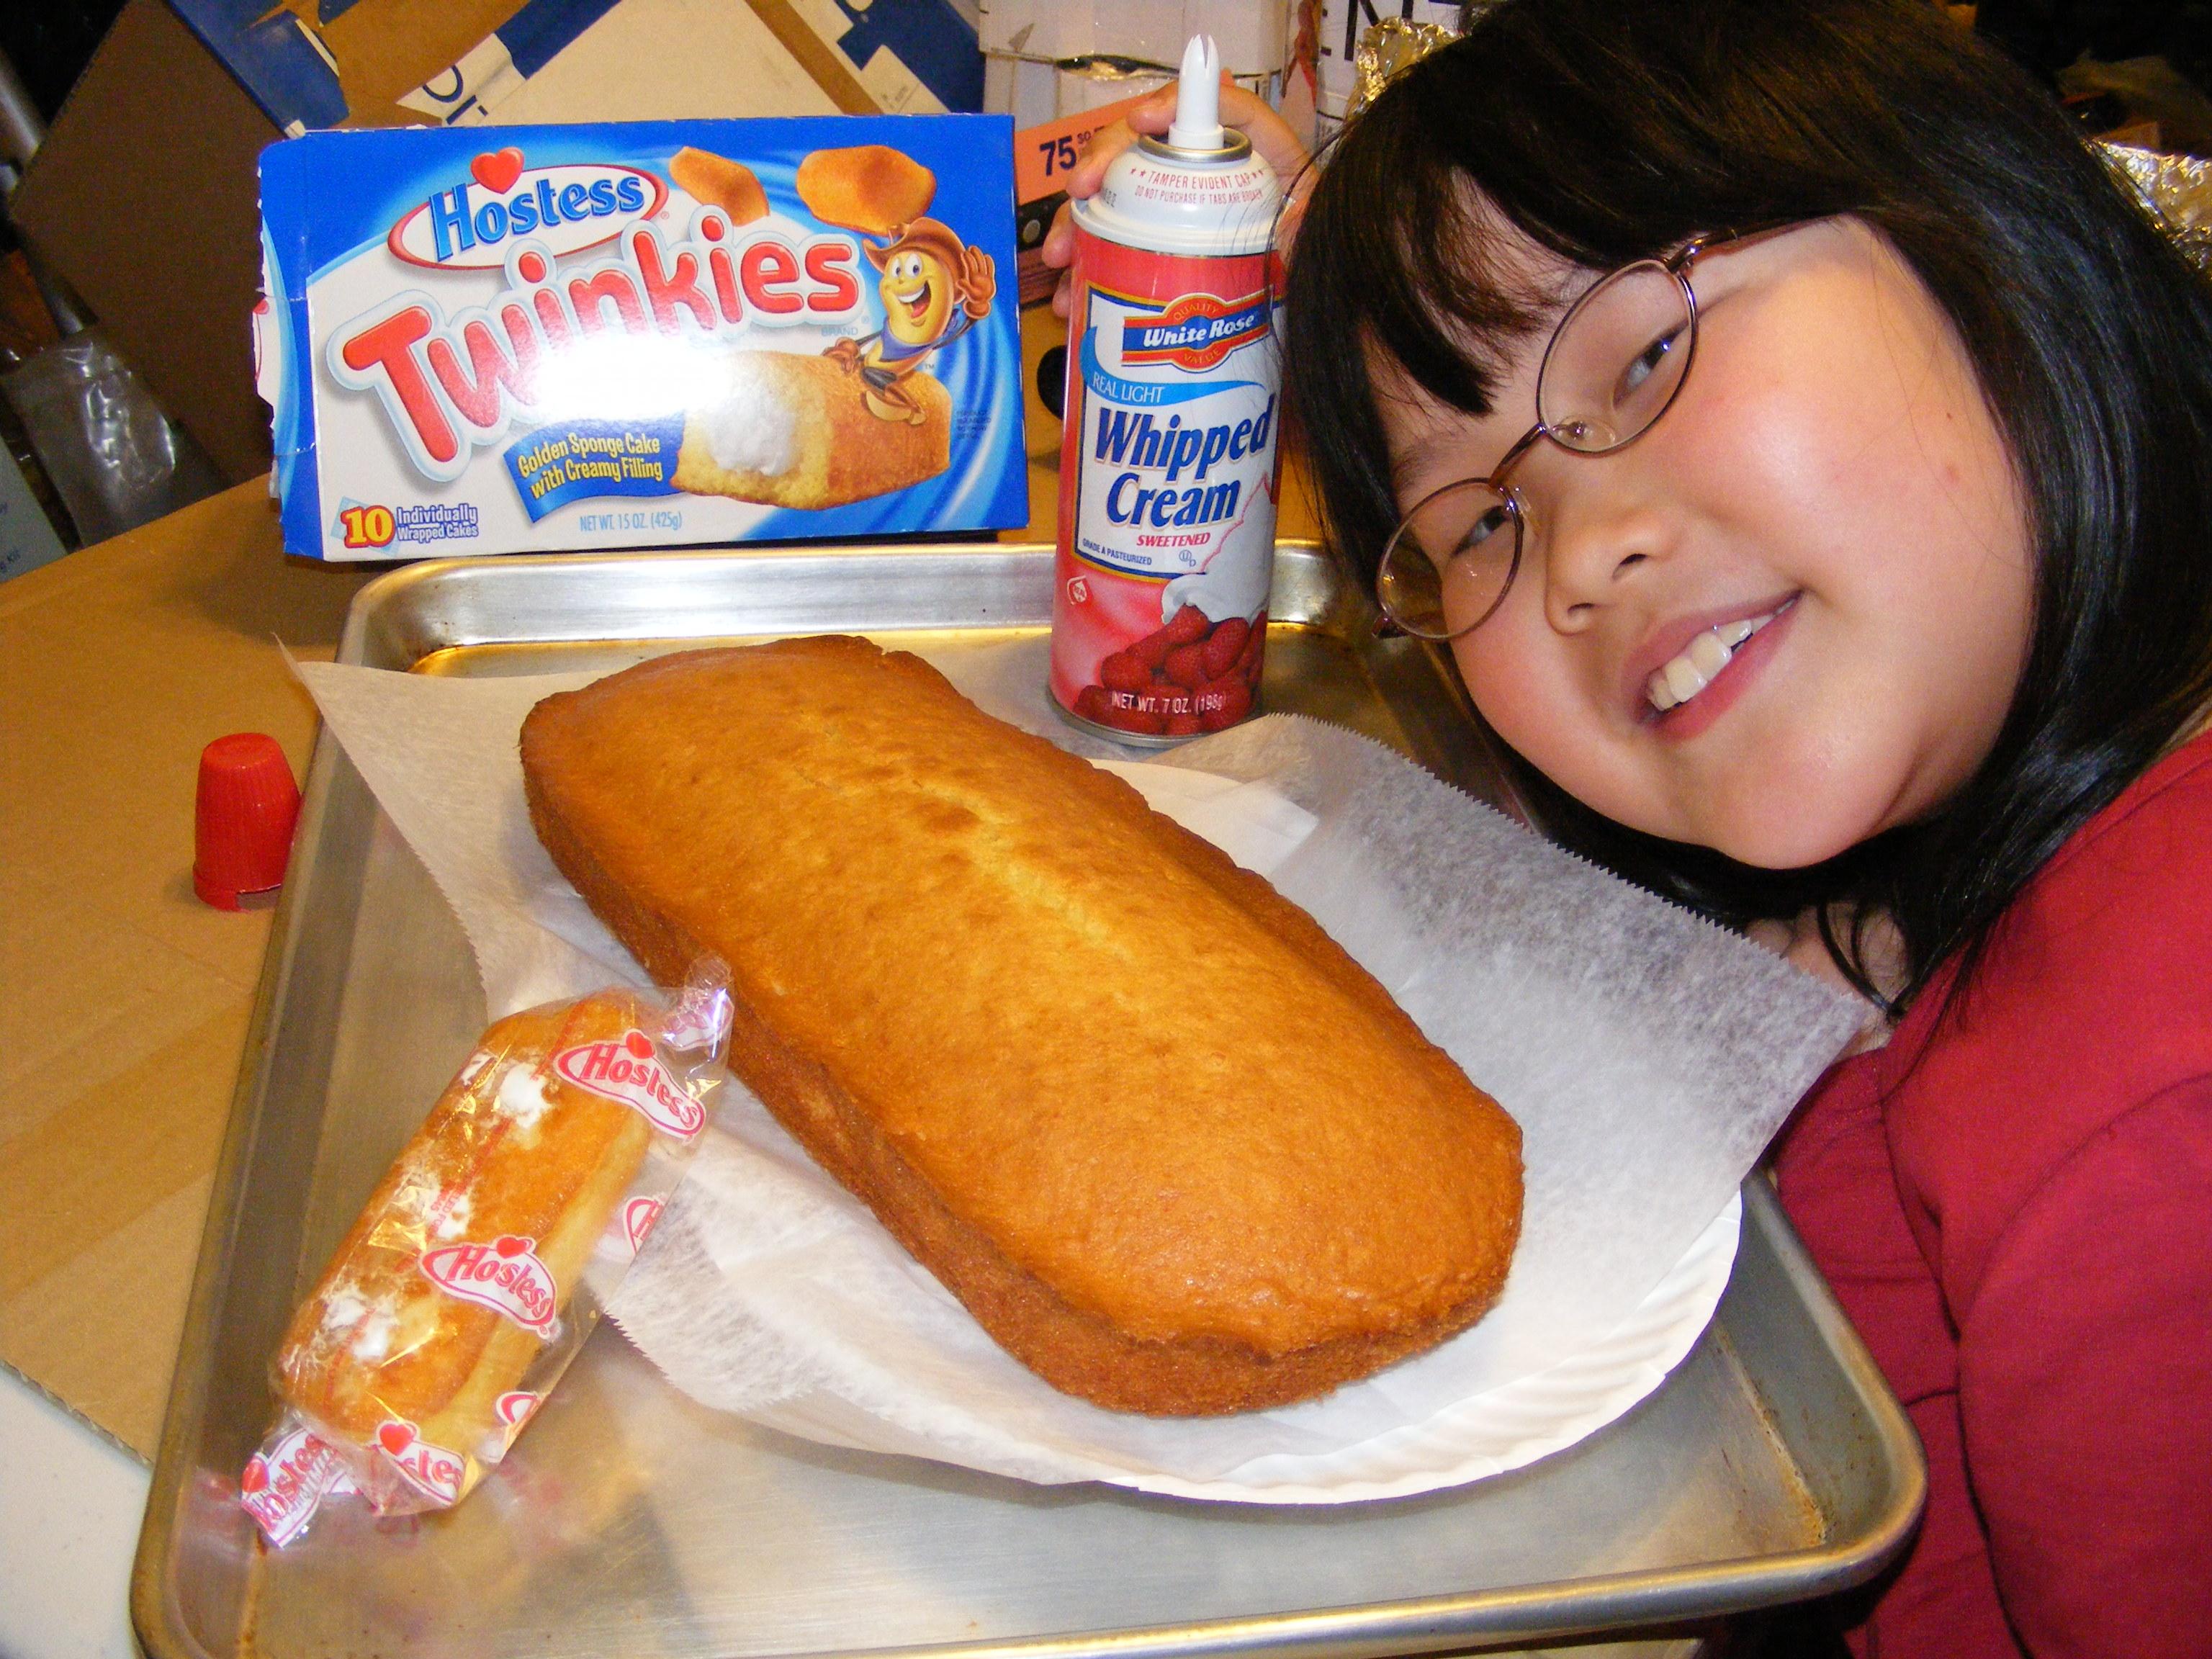 Hostess Twinkies Cake